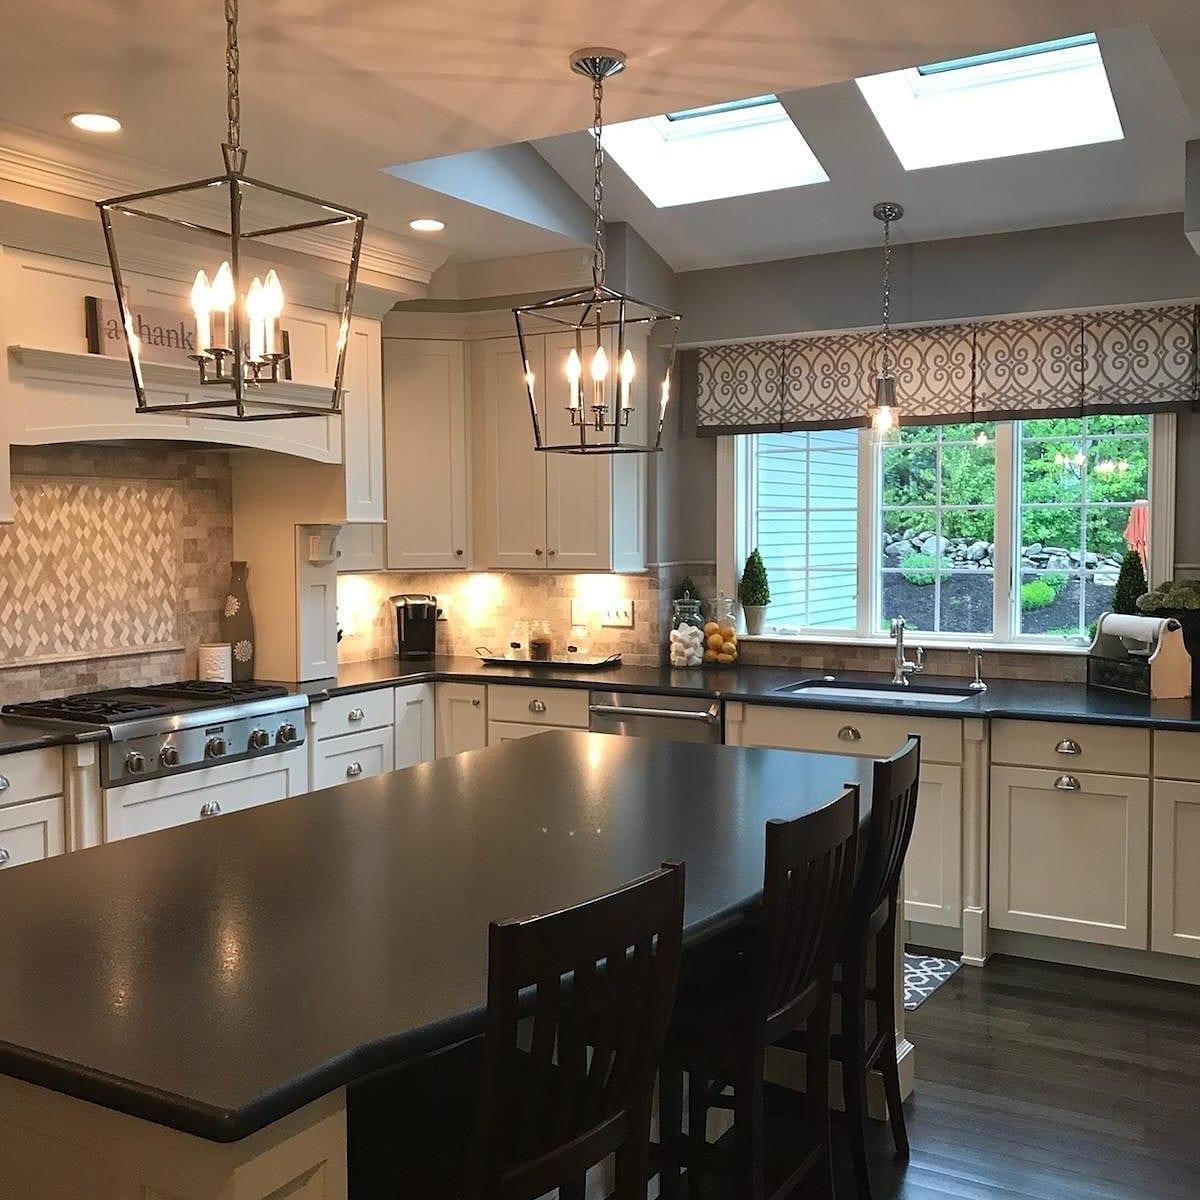 Custom Light Fixture in Kitchen